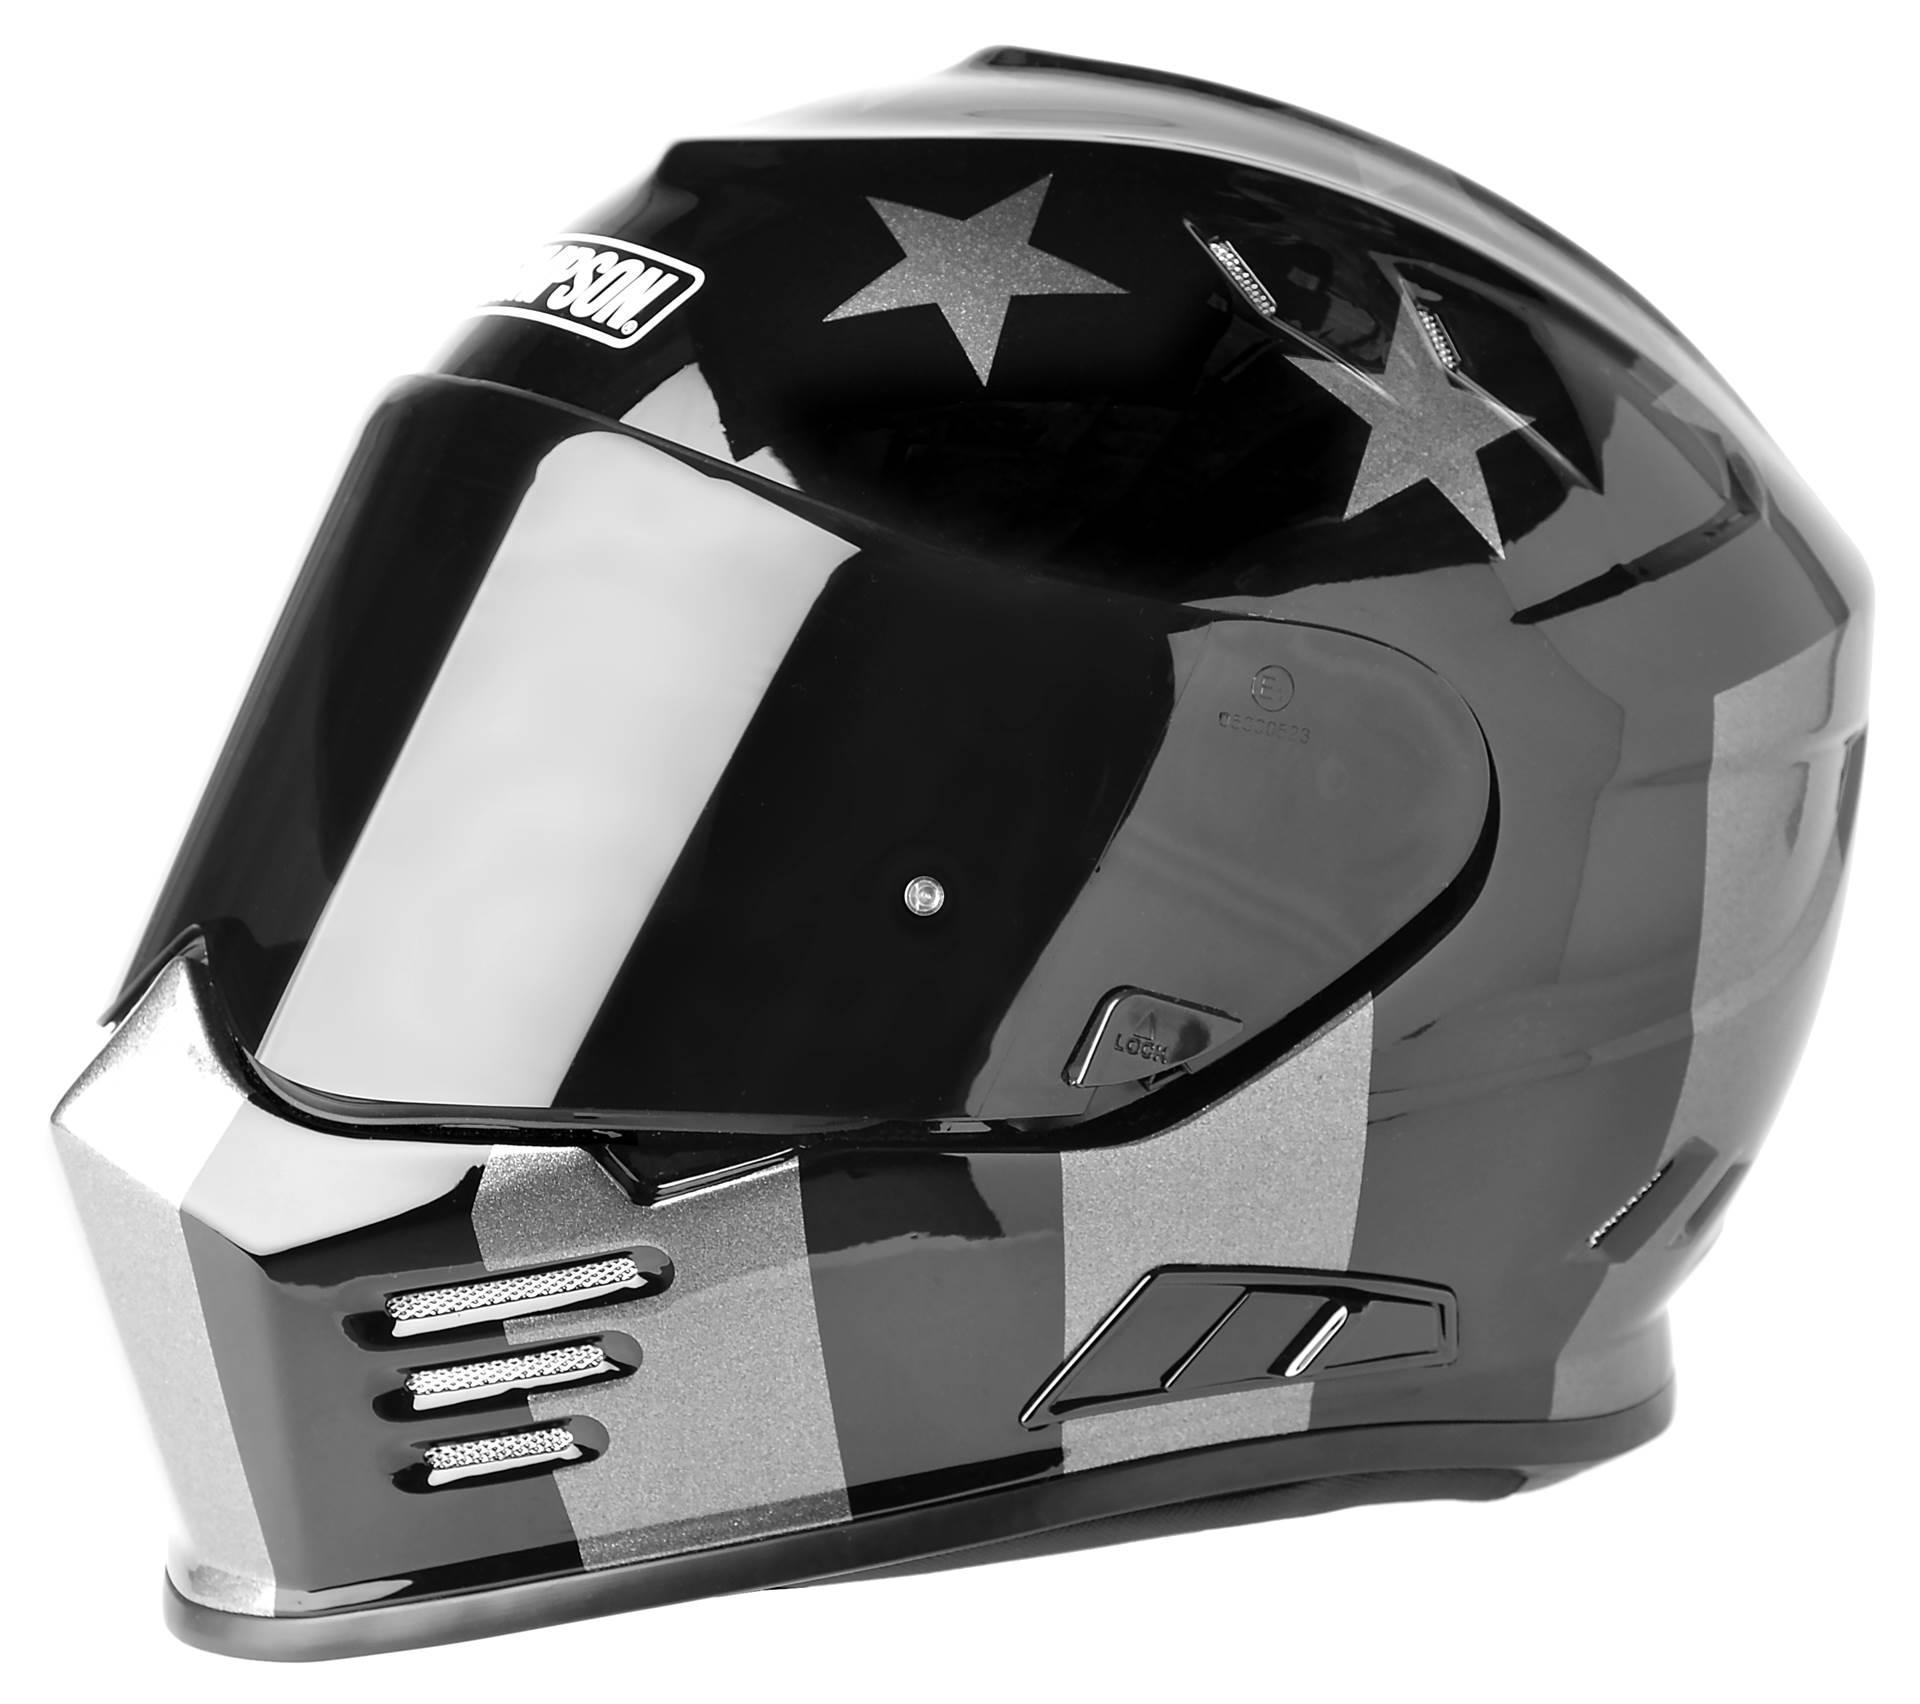 Carbon Fiber Motorcycle Helmets >> Simpson Ghost Bandit Subdued Helmet - RevZilla